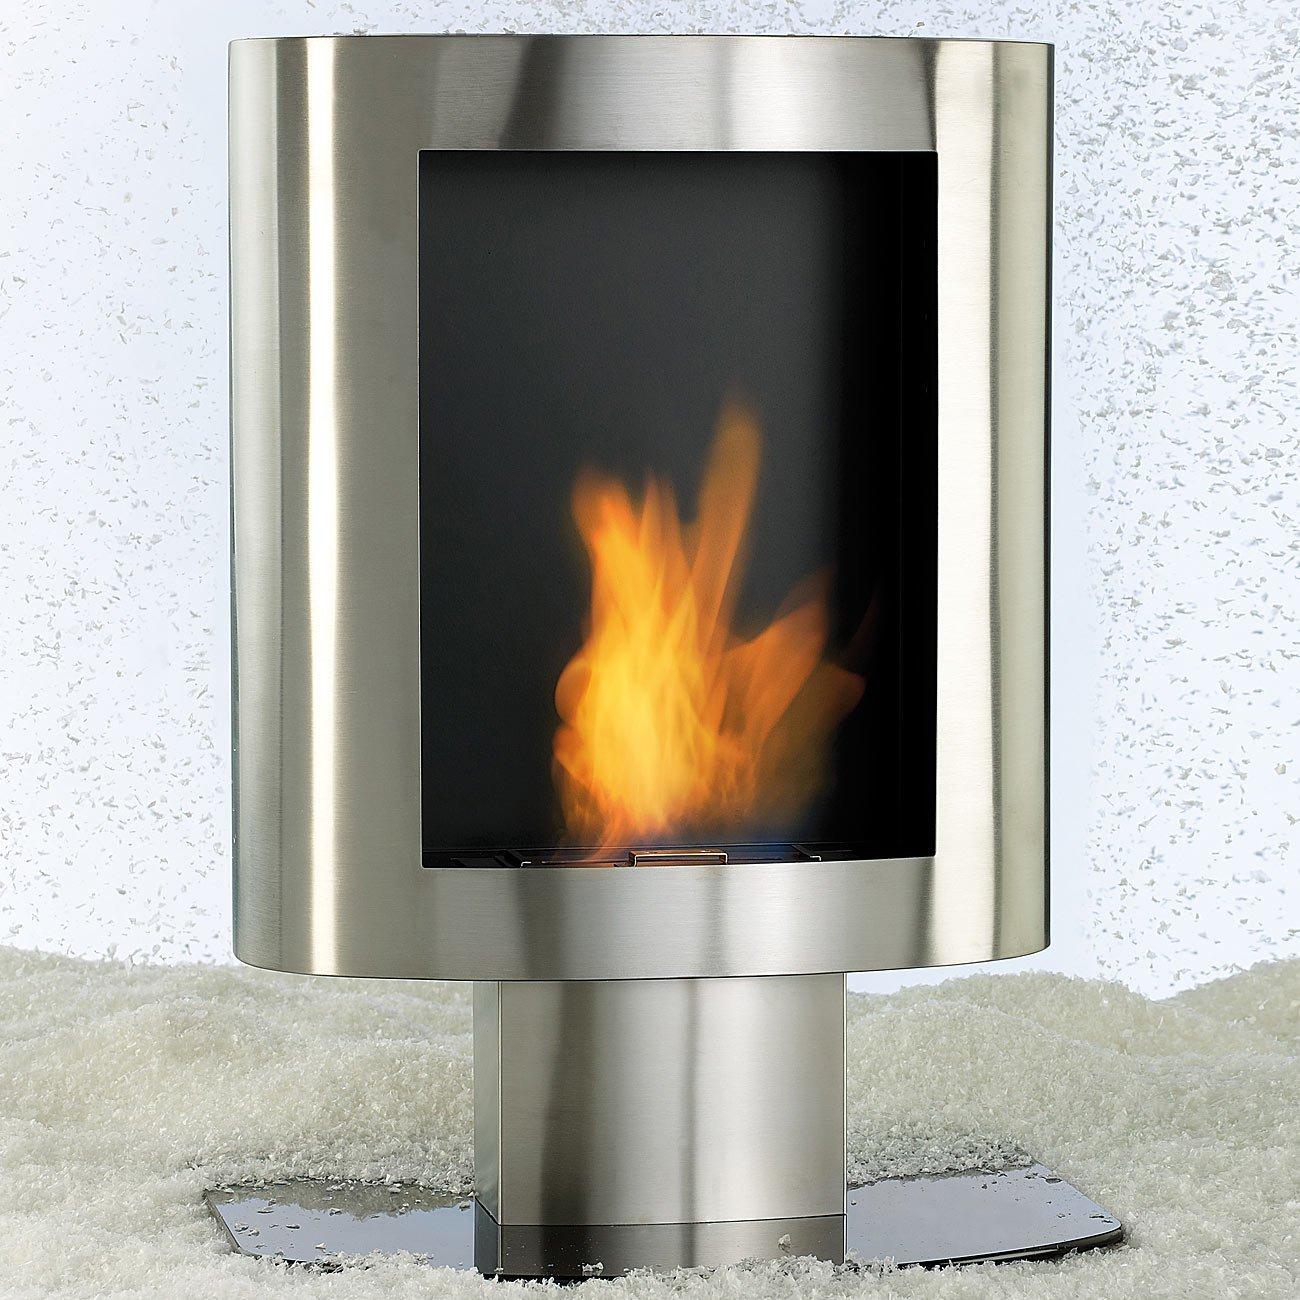 bioethanol ofen heizleistung. Black Bedroom Furniture Sets. Home Design Ideas